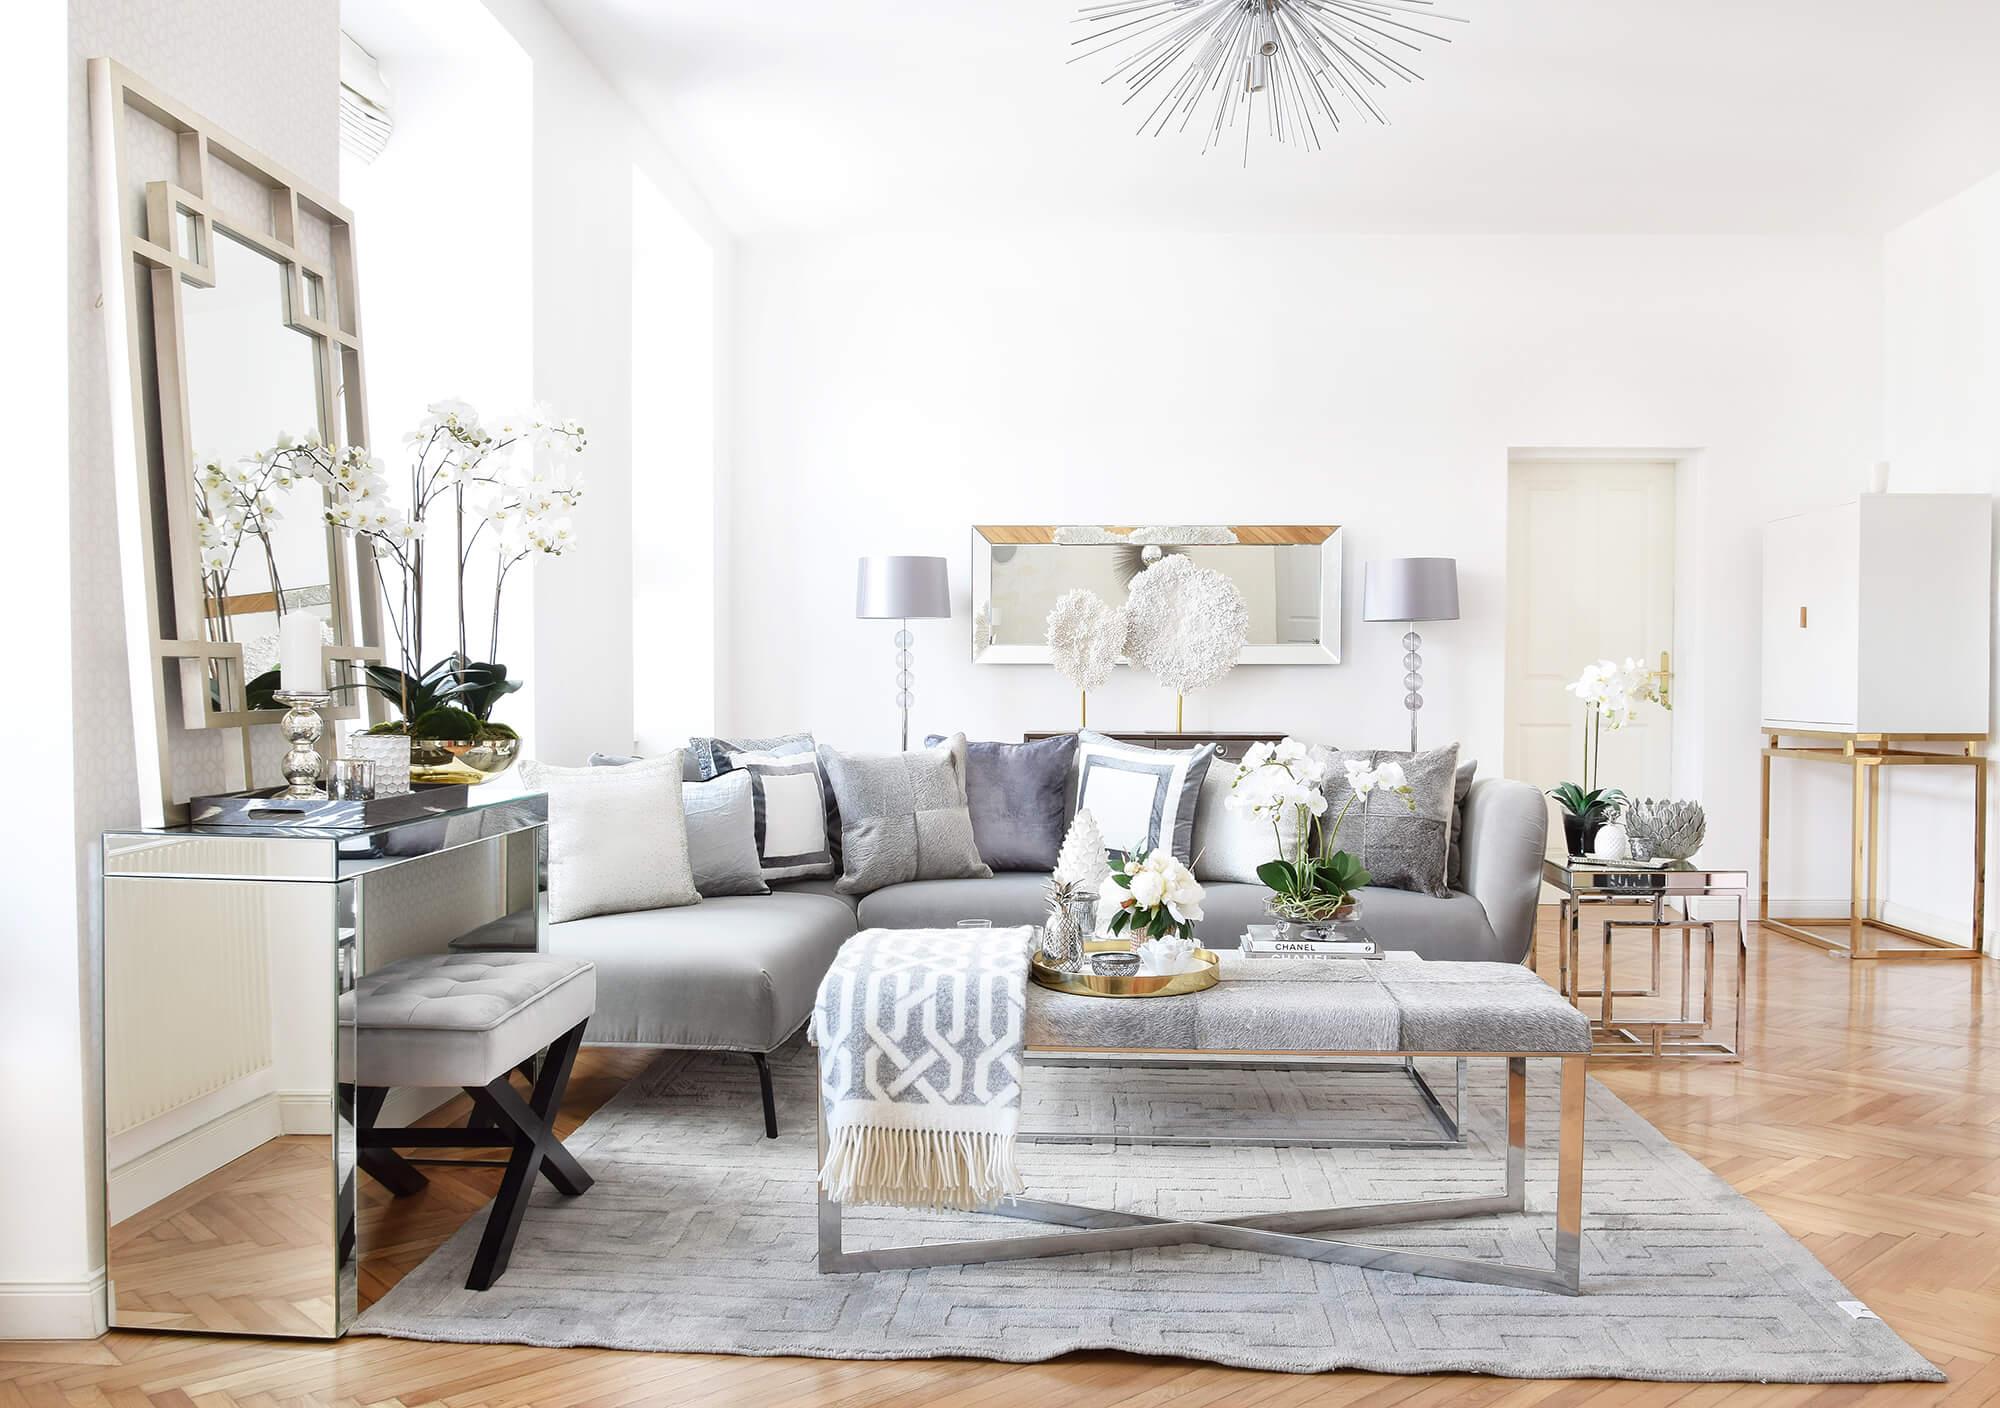 Urban Loft Livingroom Wohnzimmer in Silber & Grau Looks